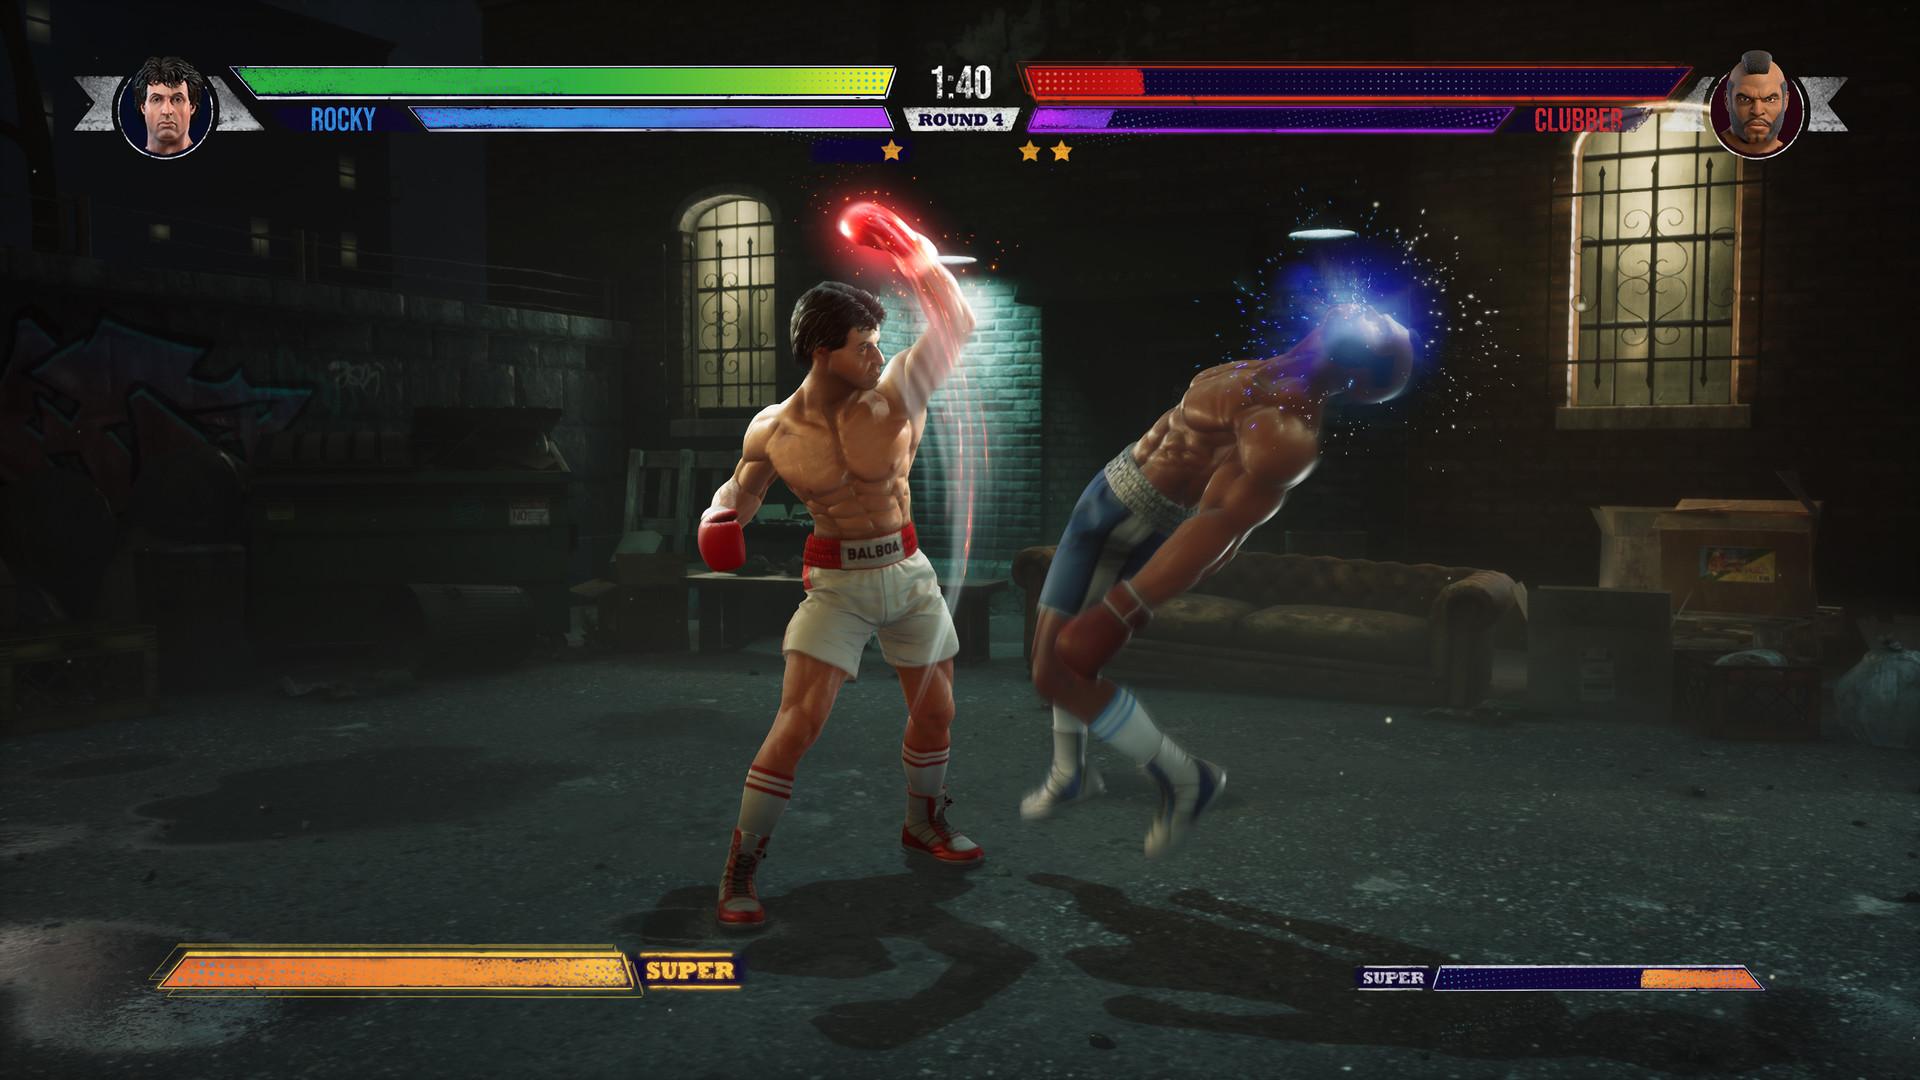 big-rumble-boxing-creed-champions-pc-screenshot-4